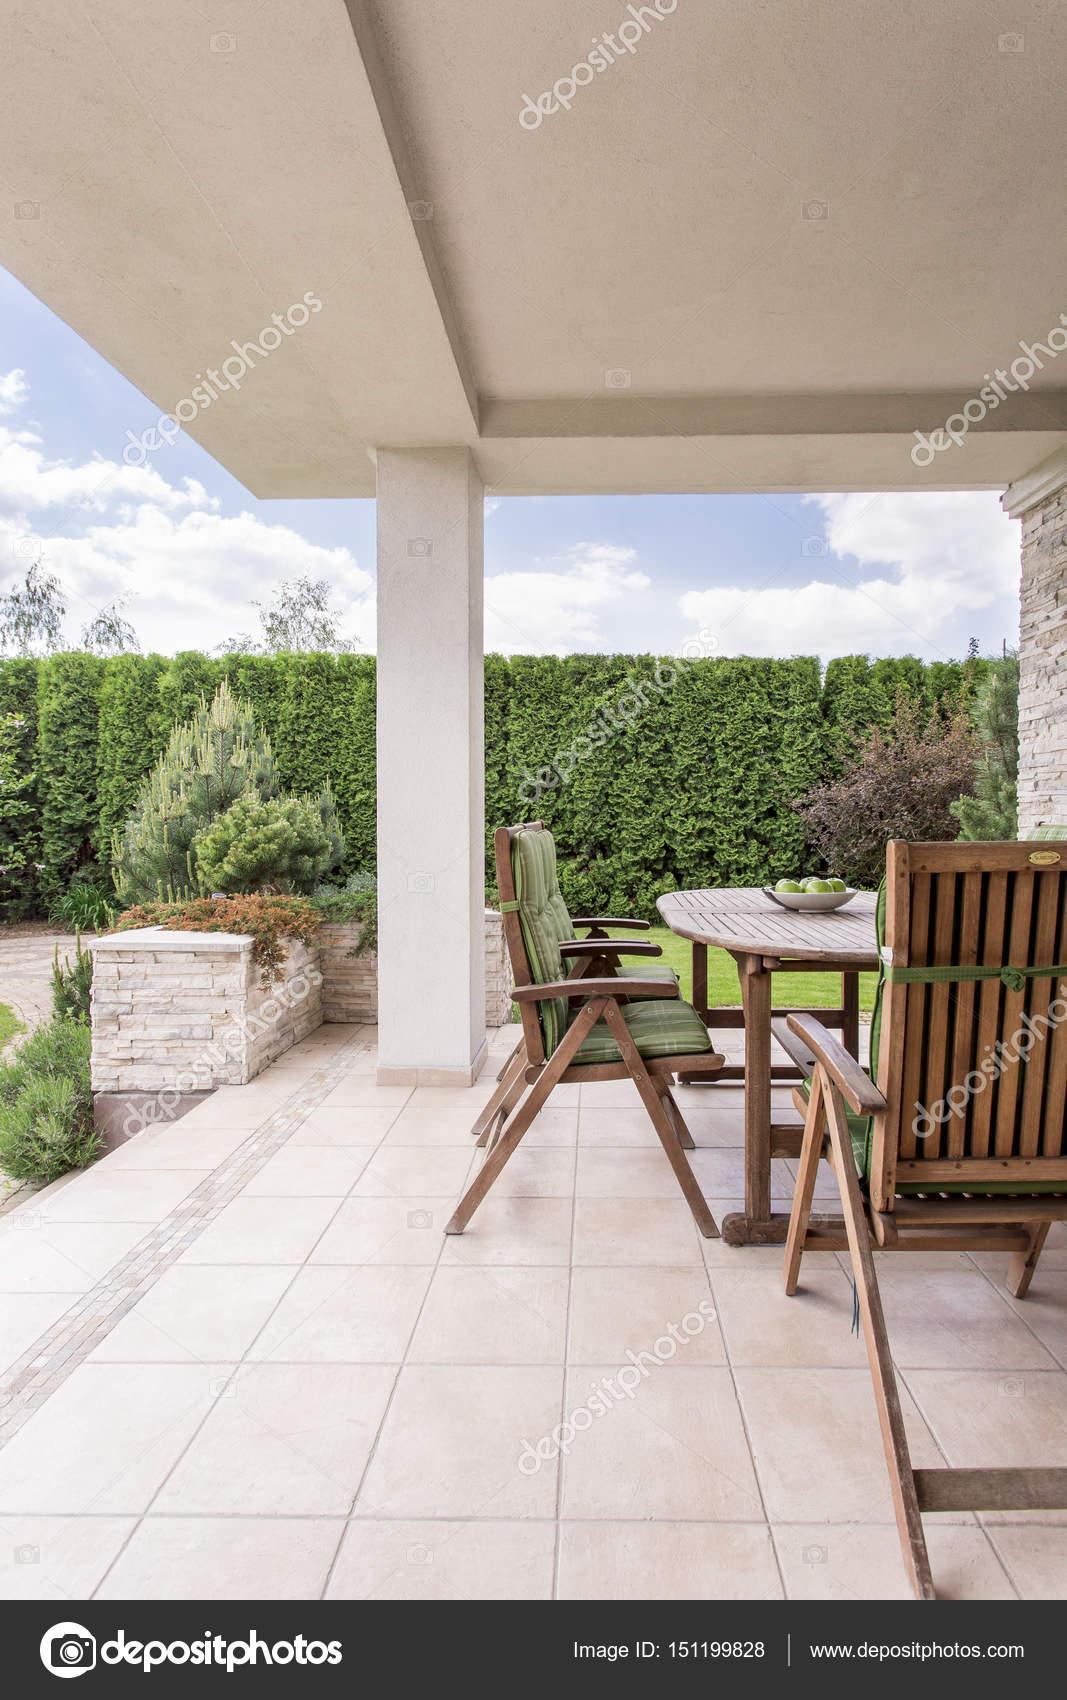 Modernes Haus mit Terrasse — Stockfoto © photographee.eu #151199828